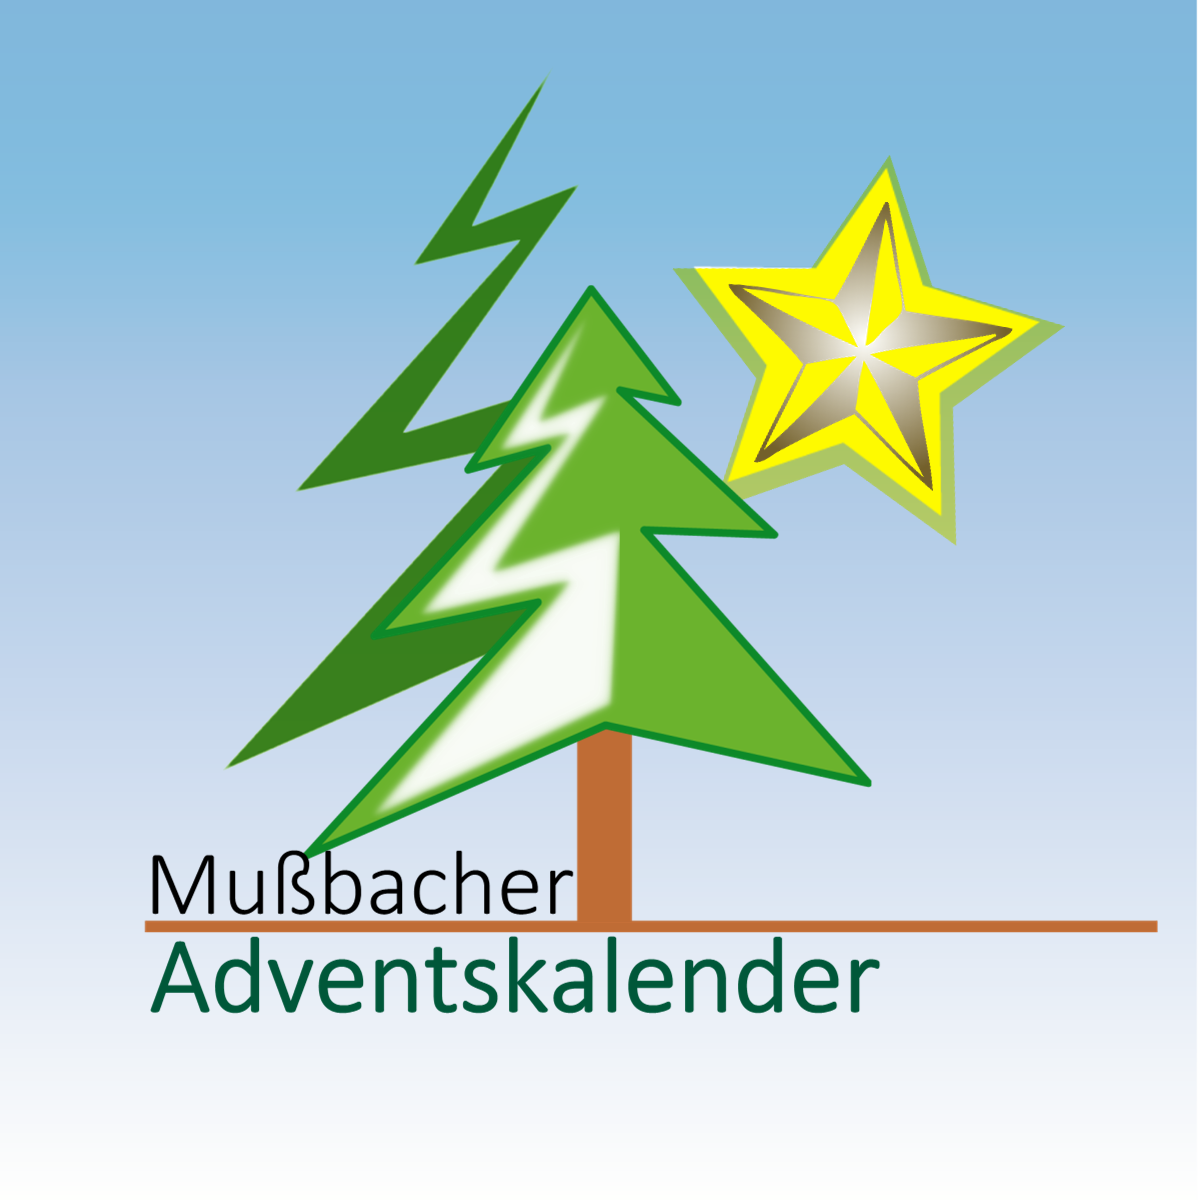 Mußbacher Adventskalender